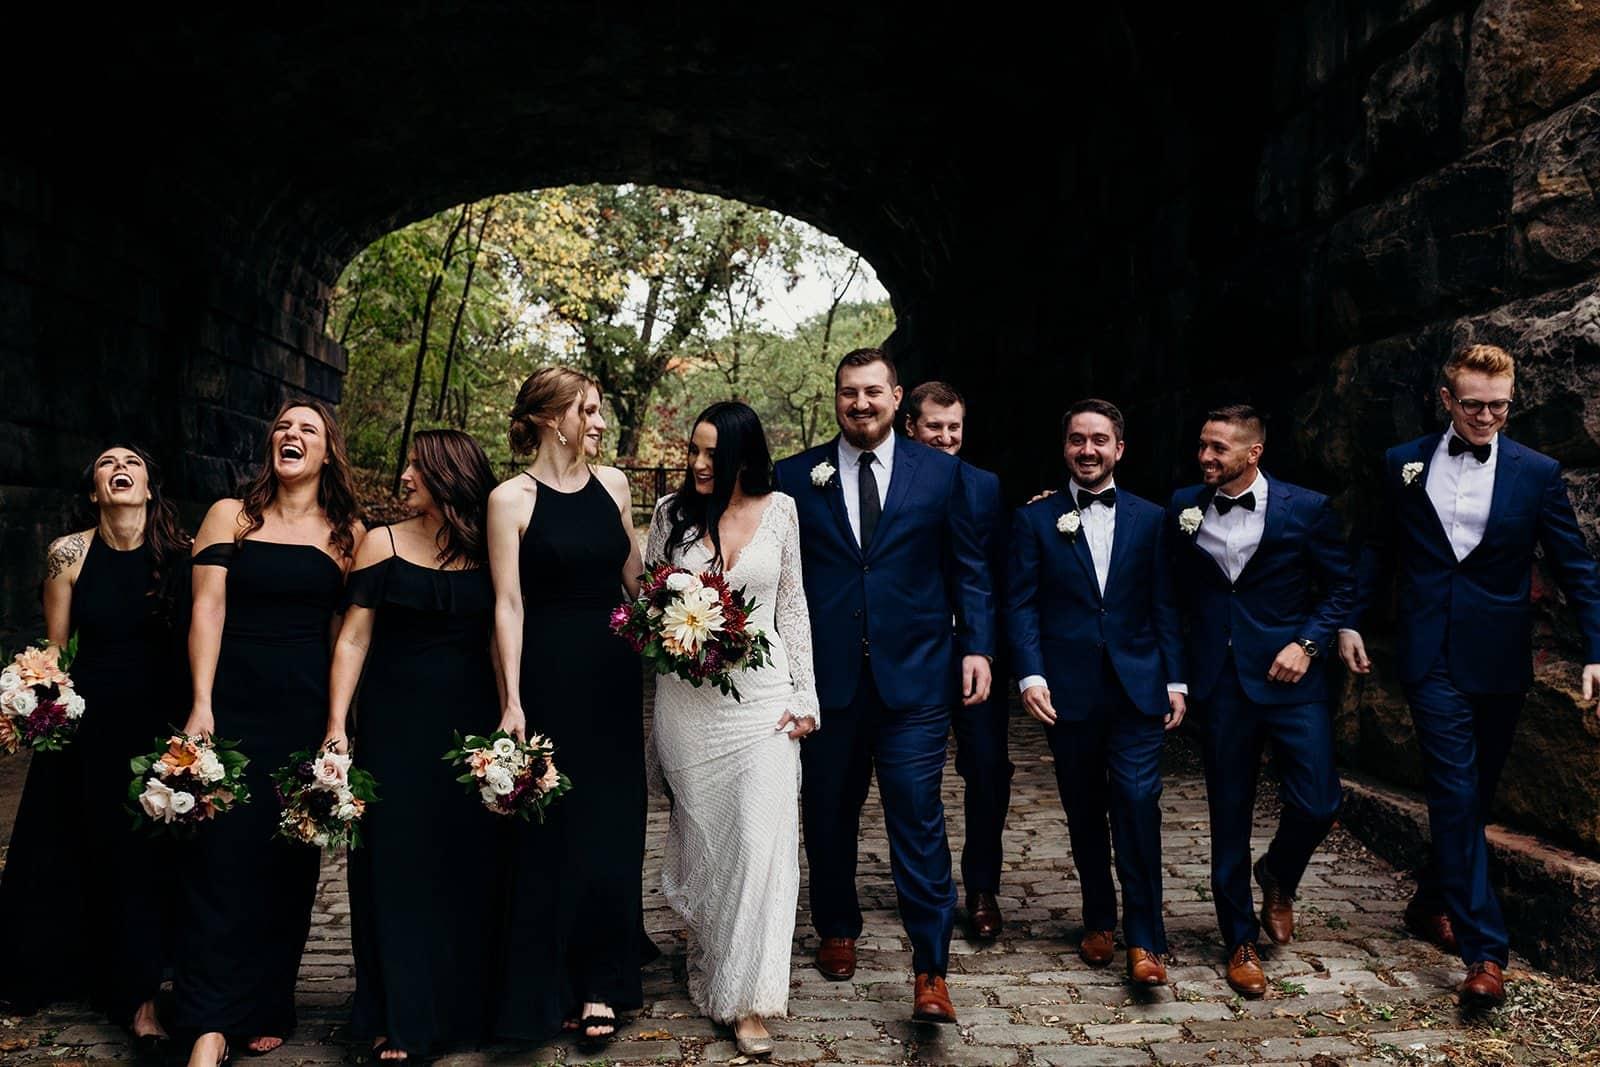 bridal party walking under covered bridge